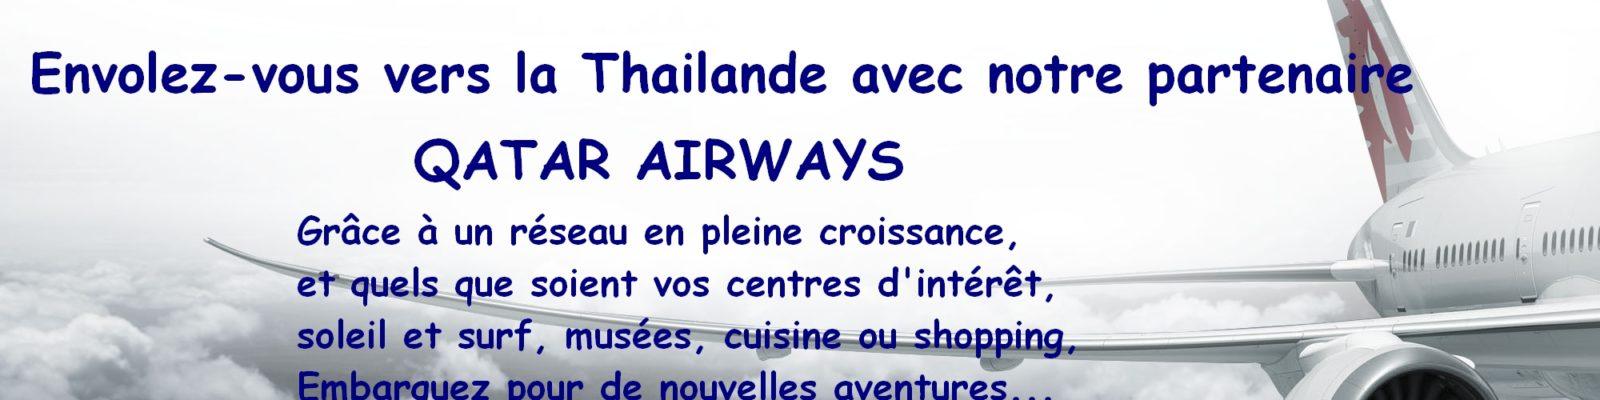 Thailande, réserver avec Qatar Airways